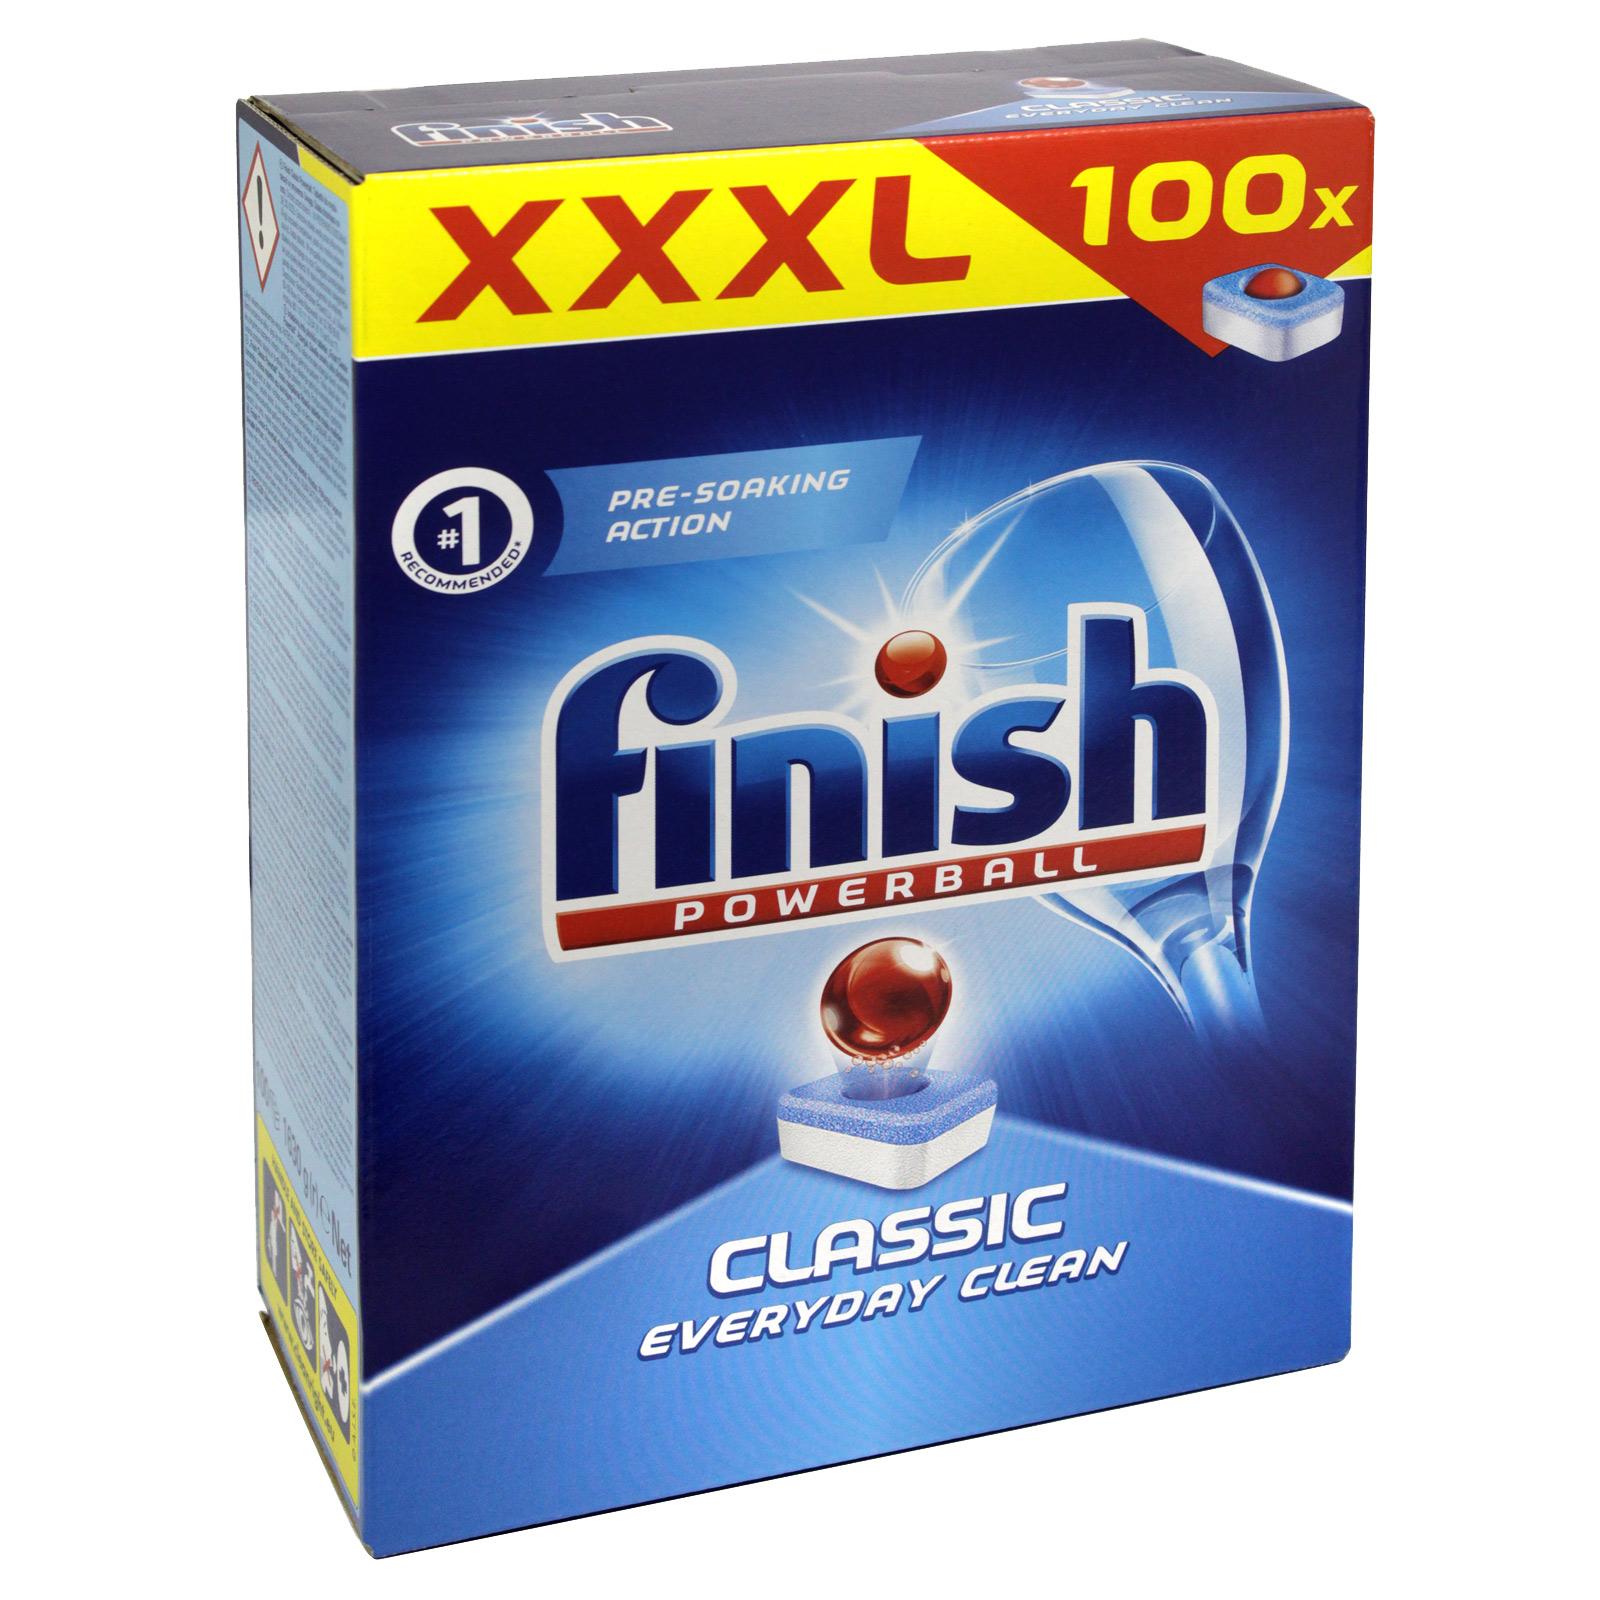 FINISH POWERBALL CLASSIC 100S MEGA